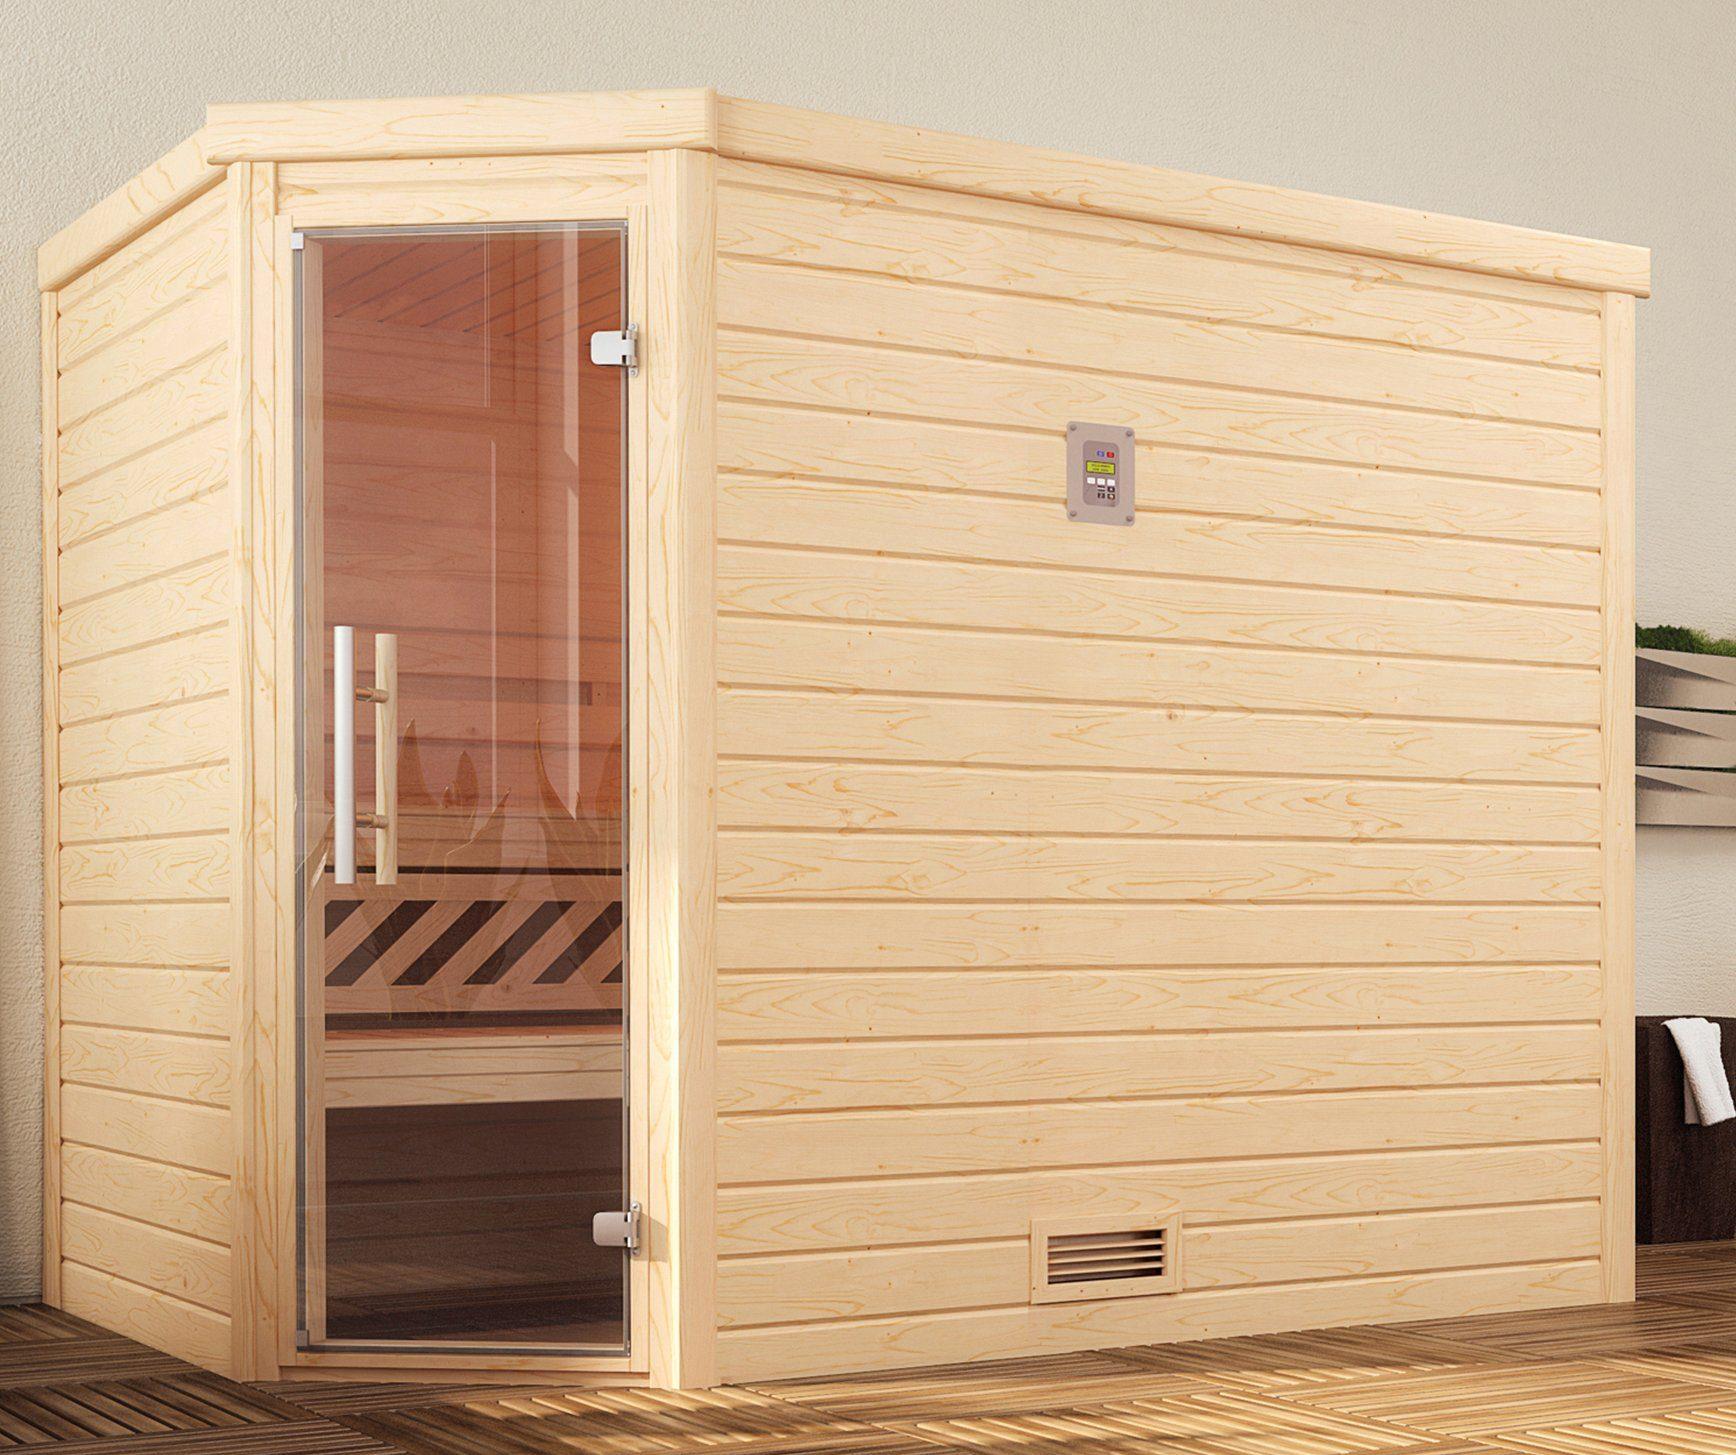 WEKA Sauna »Turku Eck Gr.2«, 245x195x204 cm, ohne Ofen, Glastür